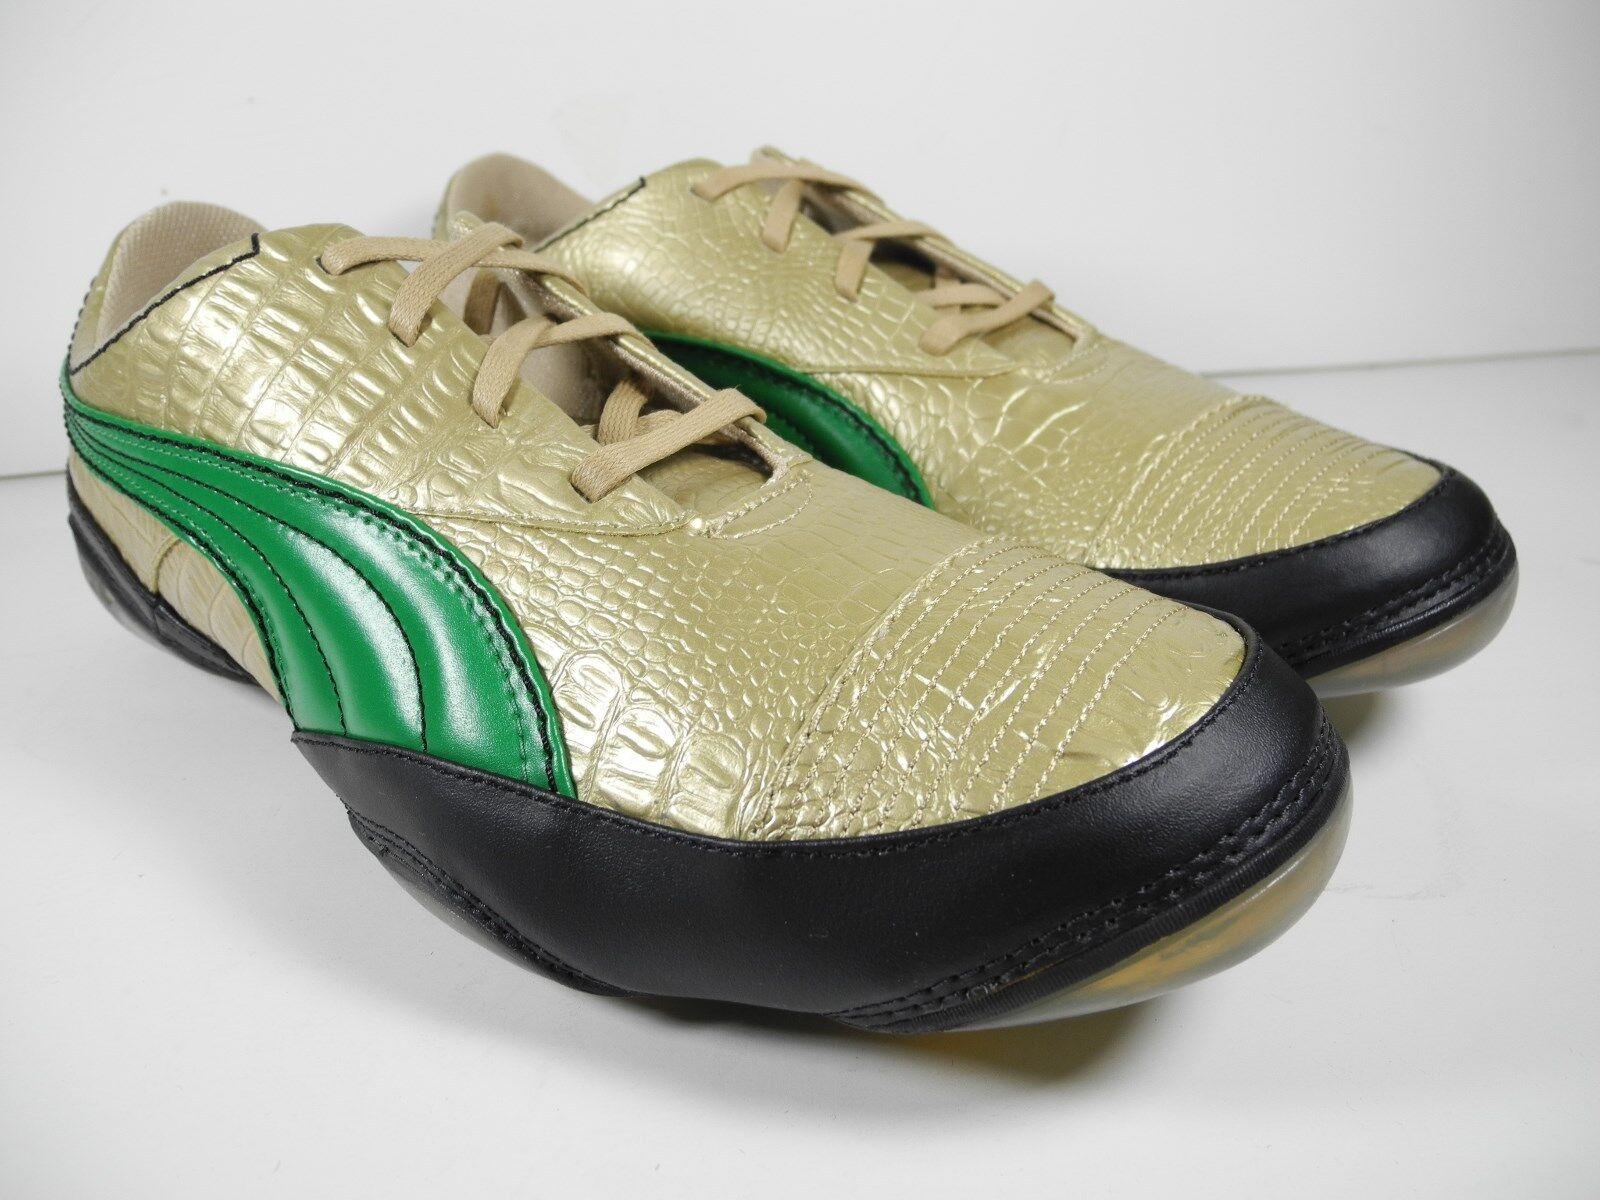 371fe378f7590 ... NEW Puma USAN METALLIC CROC CROC CROC Men s Shoes Size US 11.5 62825c  ...